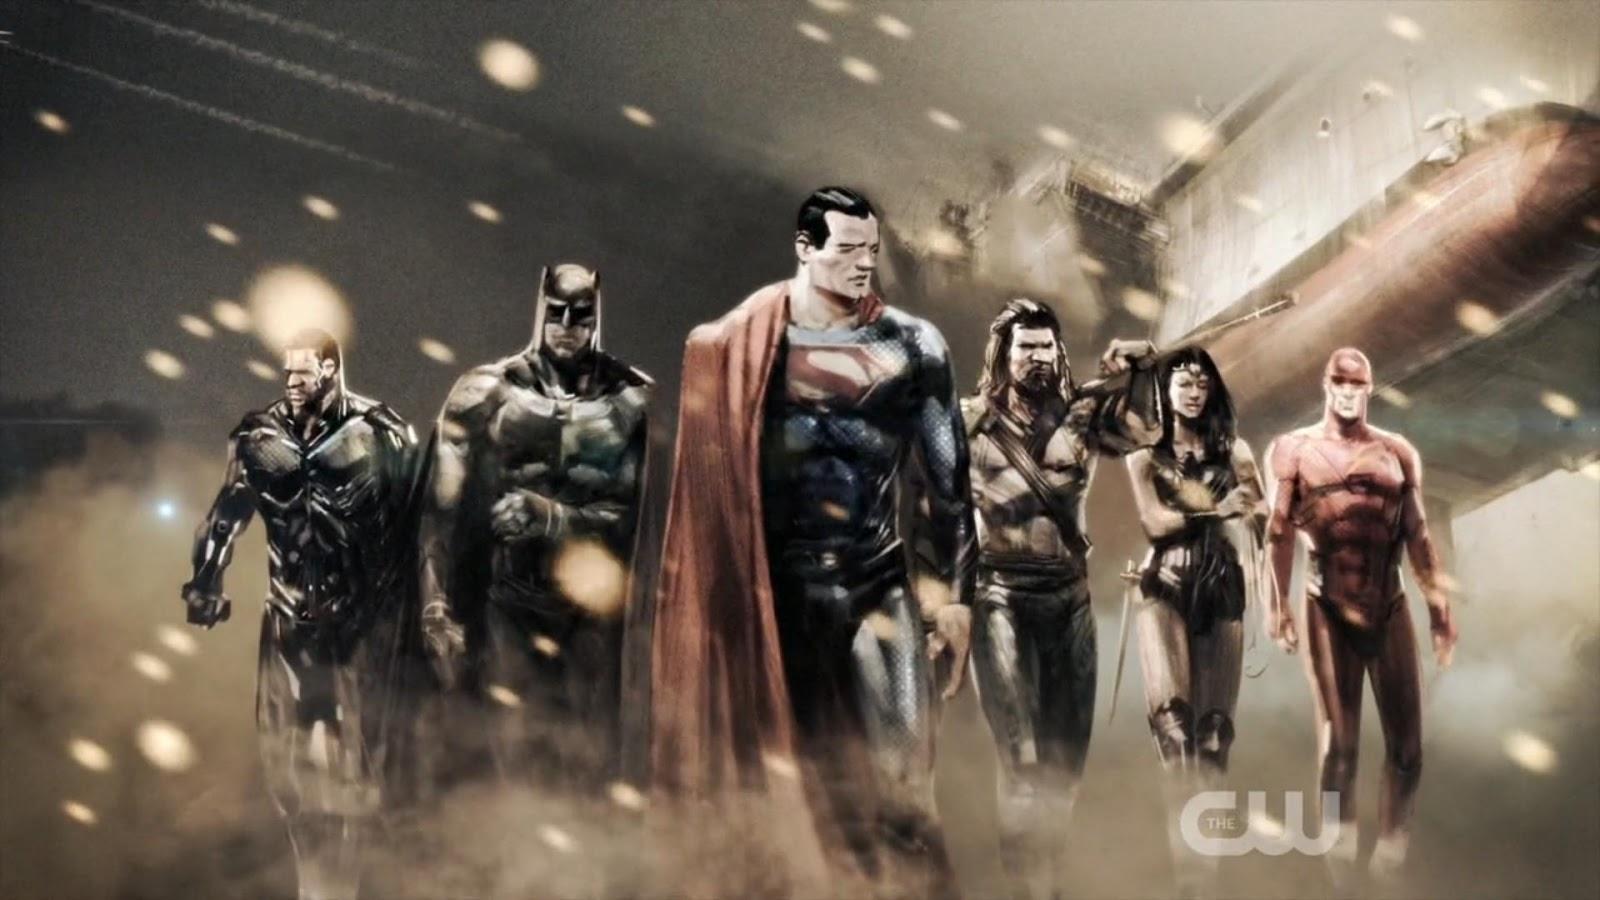 Justice League Full HD Wallpapers - HD Wallpaper 2017